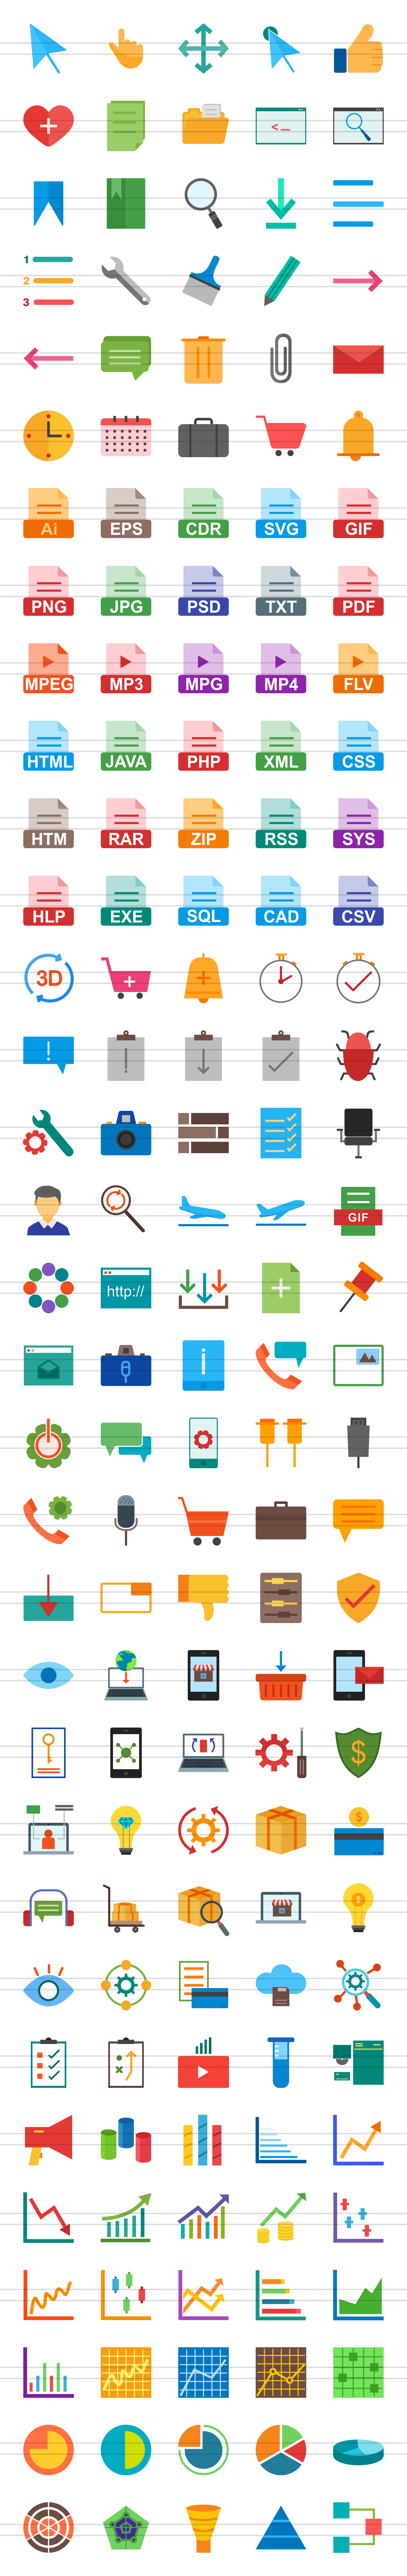 166 Interface Flat Icons example image 2